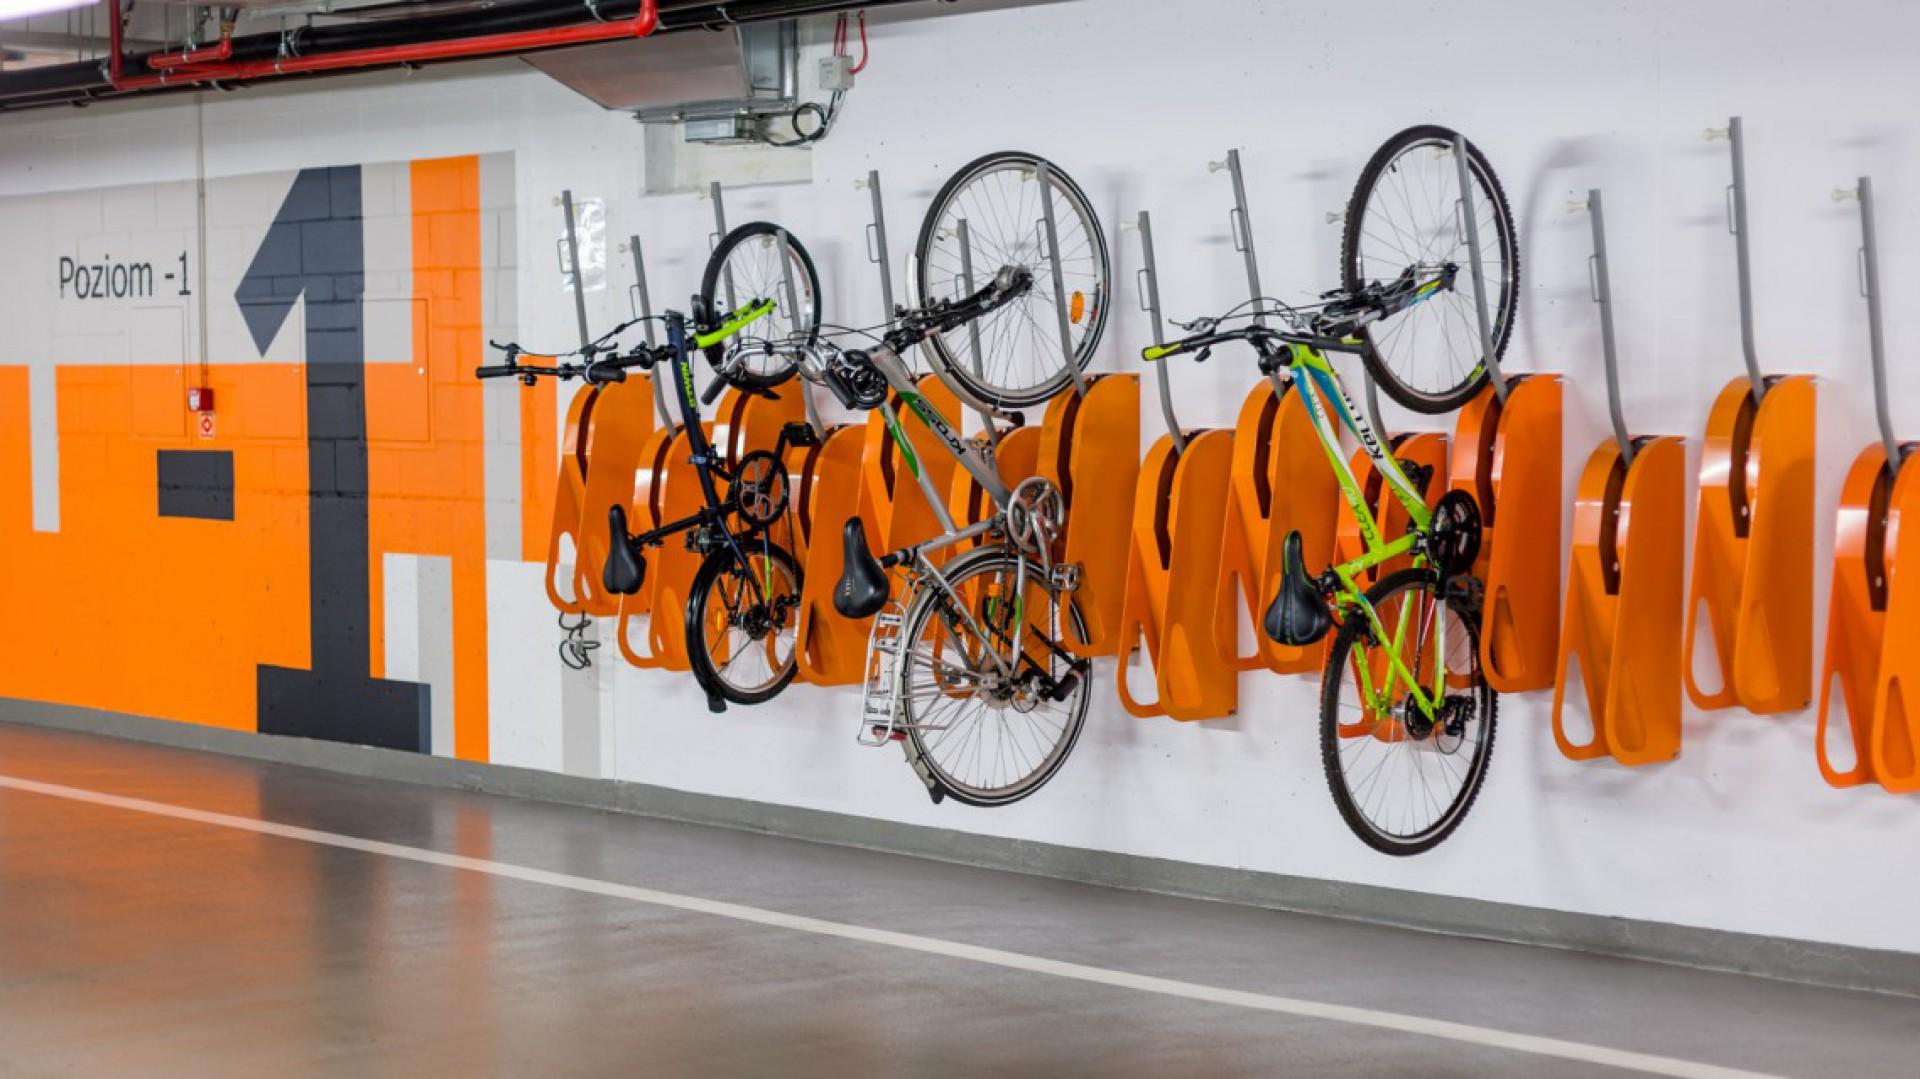 Fot. mat. prasowe Bike2Box